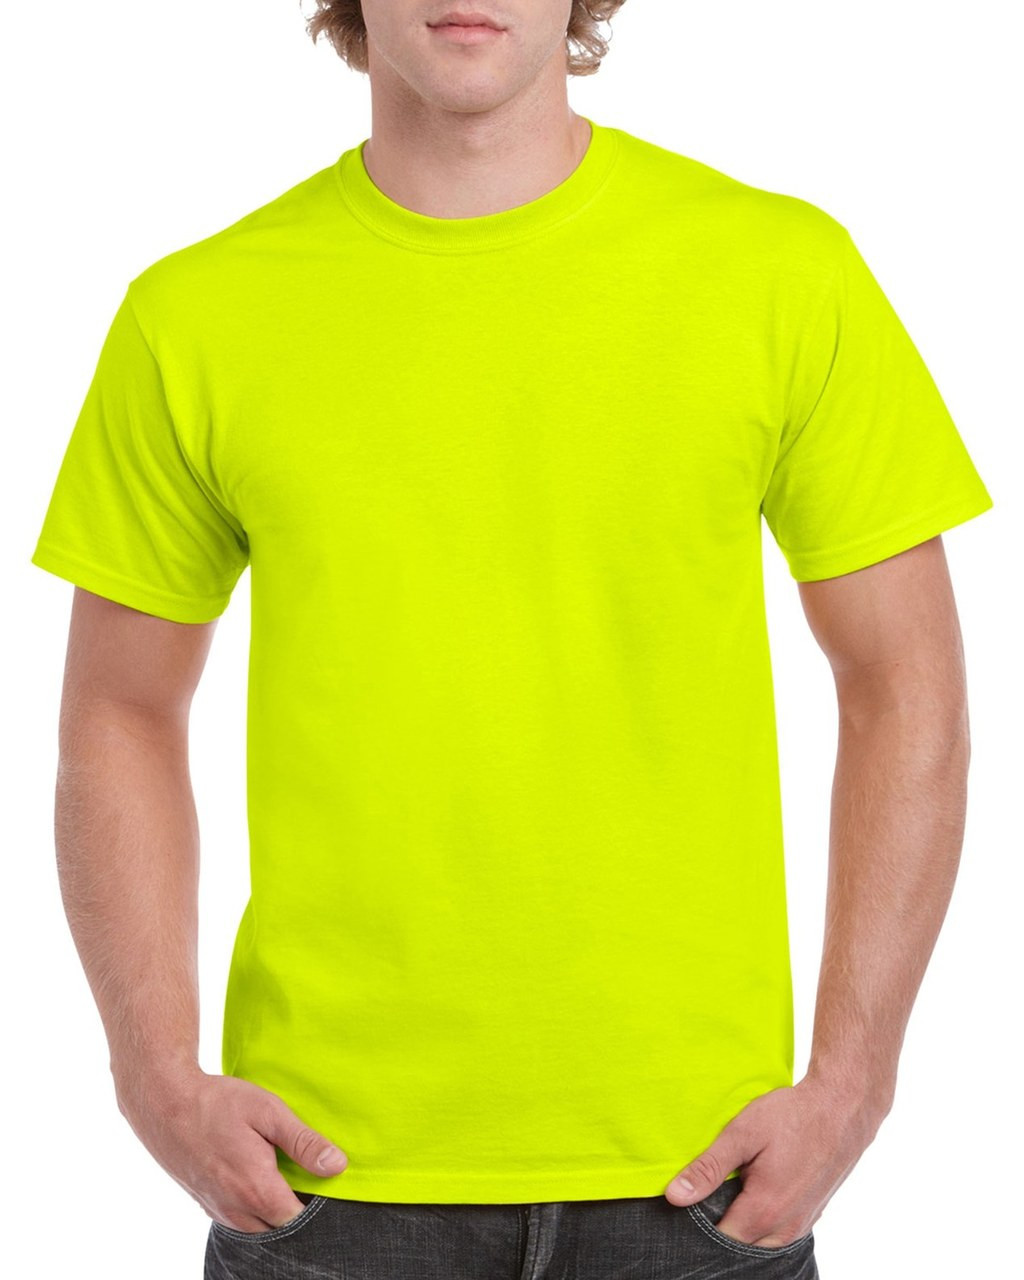 24936217 5000 - Gildan Heavy Cotton Adult T-Shirt